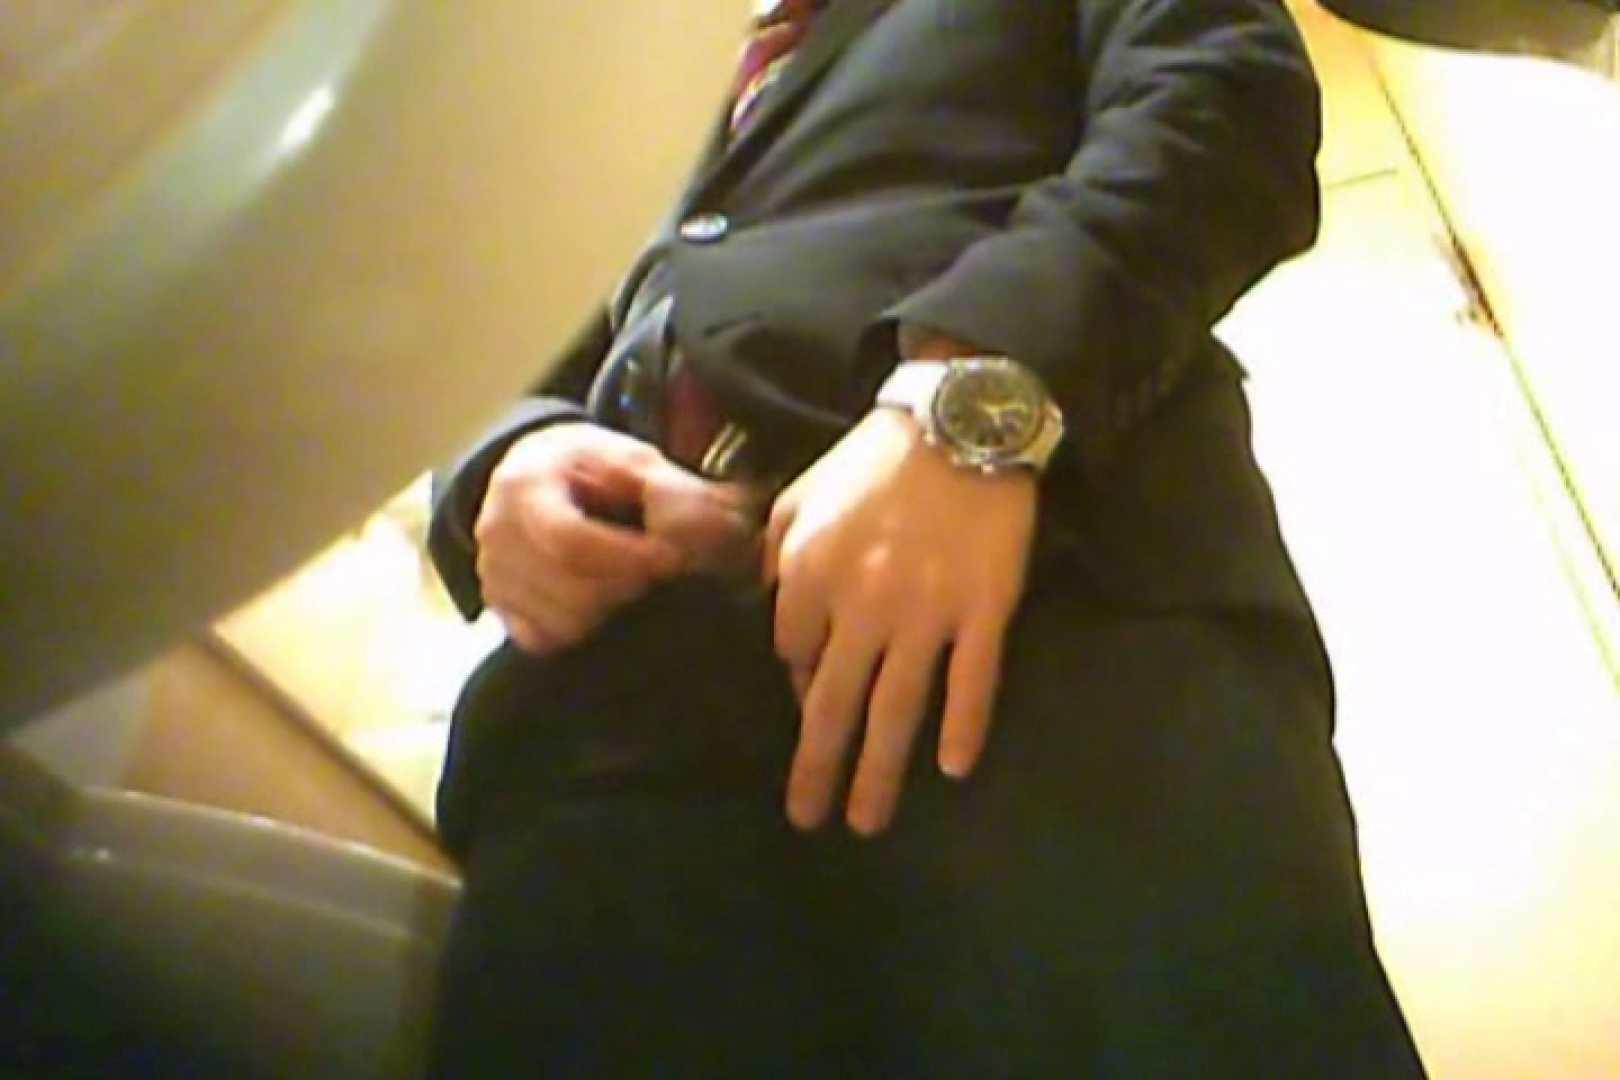 SEASON 3rd!掴み取りさんの洗面所覗き!in新幹線!VOL.21 スーツ男子 ゲイフリーエロ画像 92枚 87